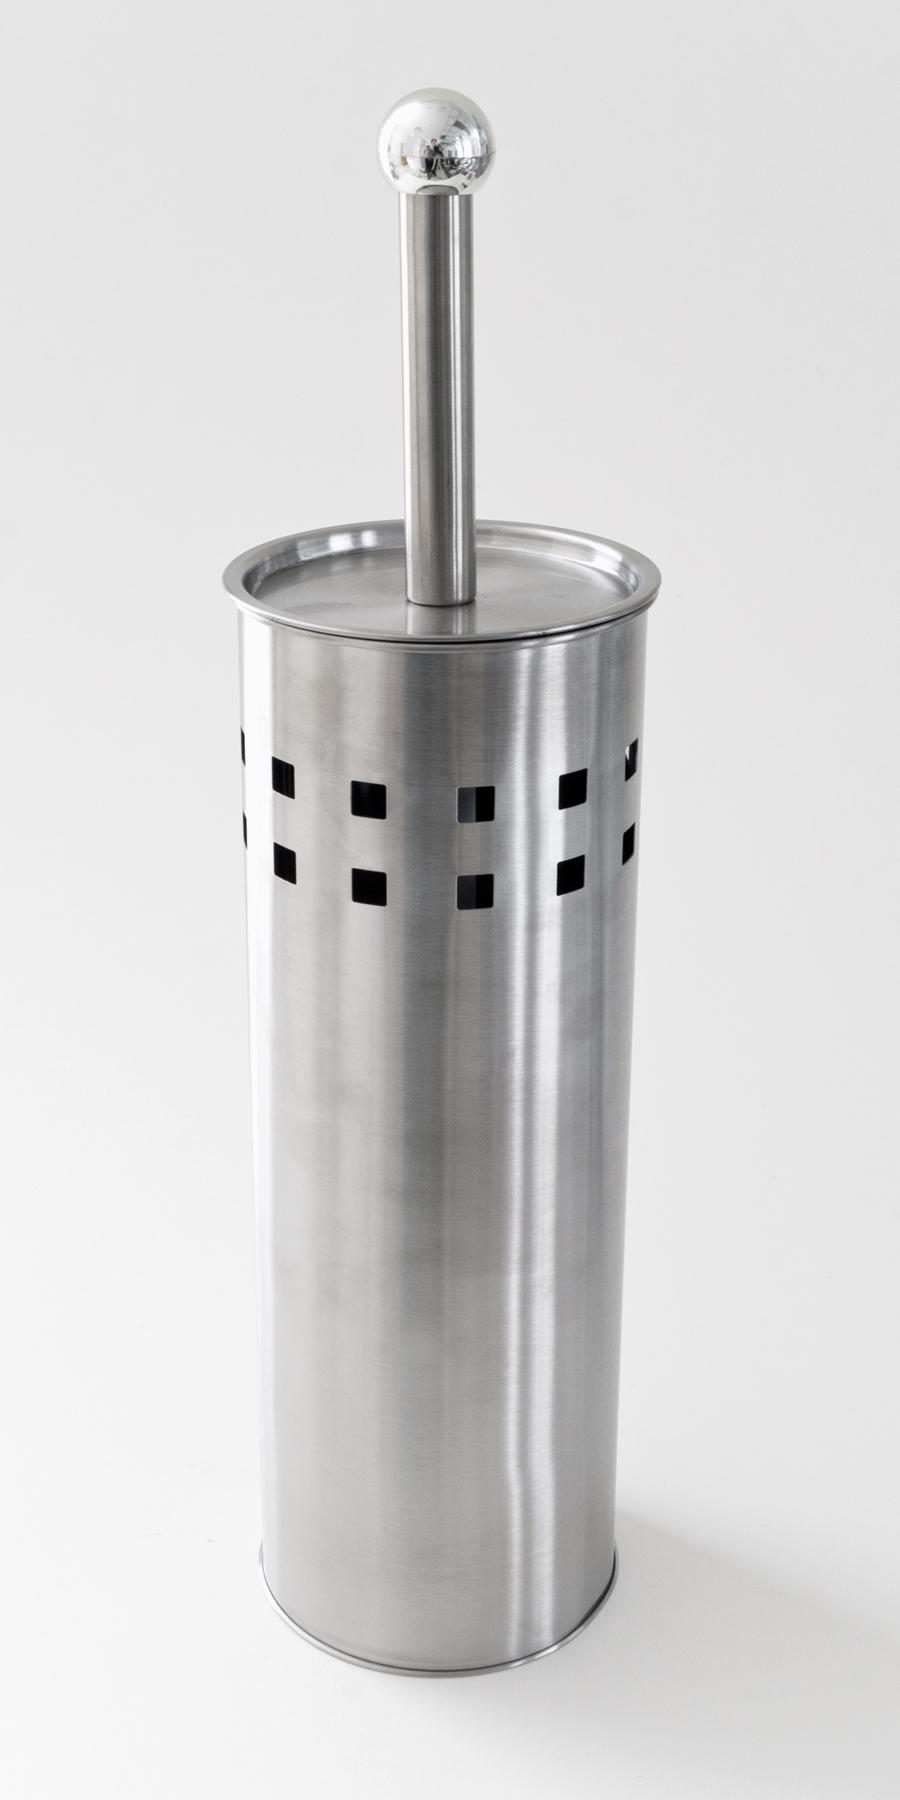 Porte brosse de toilette en métal